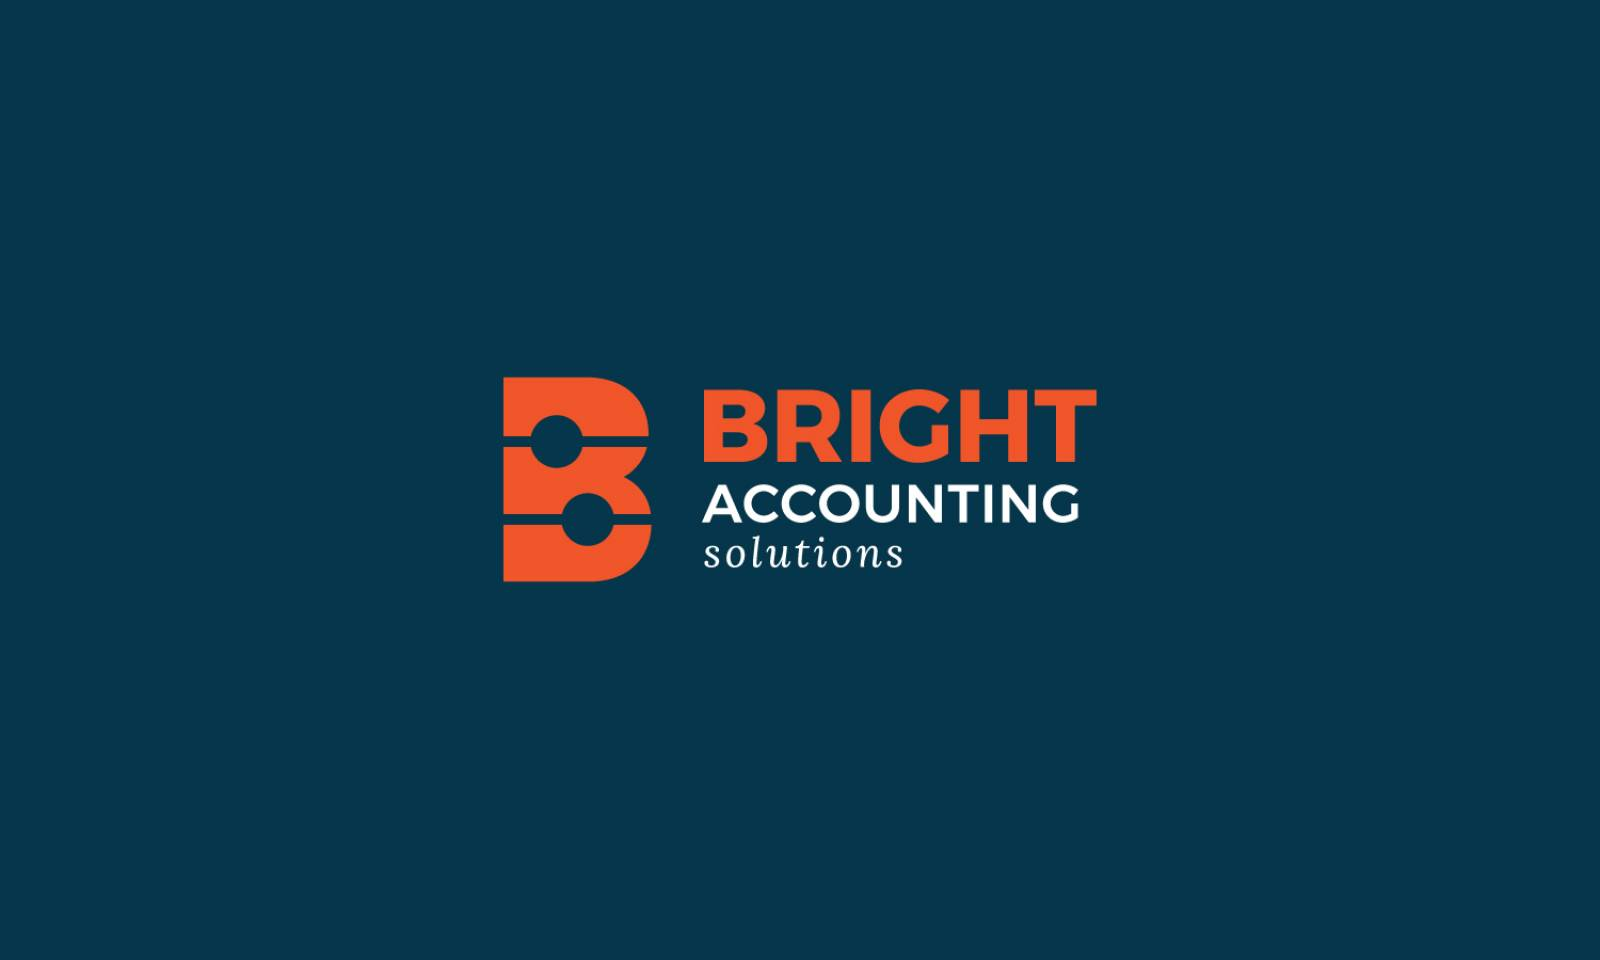 logo-Bright-corporate-identity-agency-graphic-design-canterbury.jpg